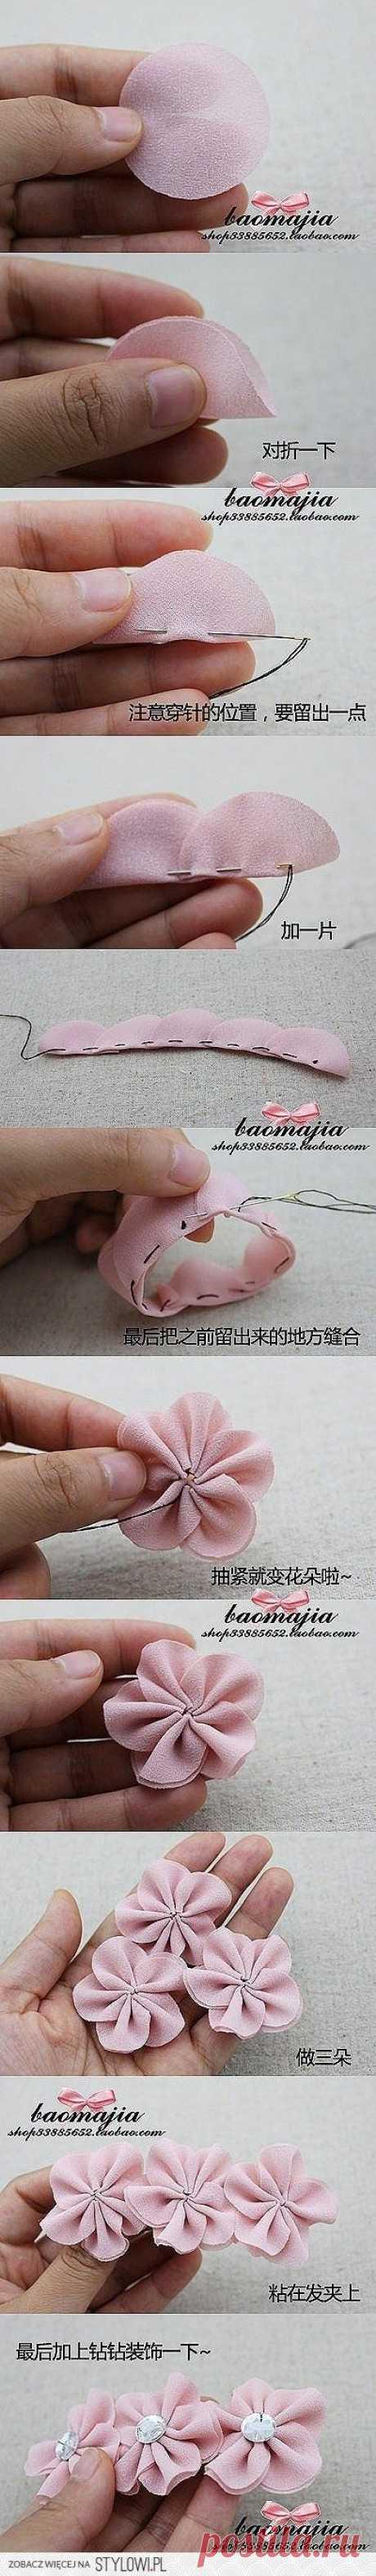 Hair bow flowers | Manualidades